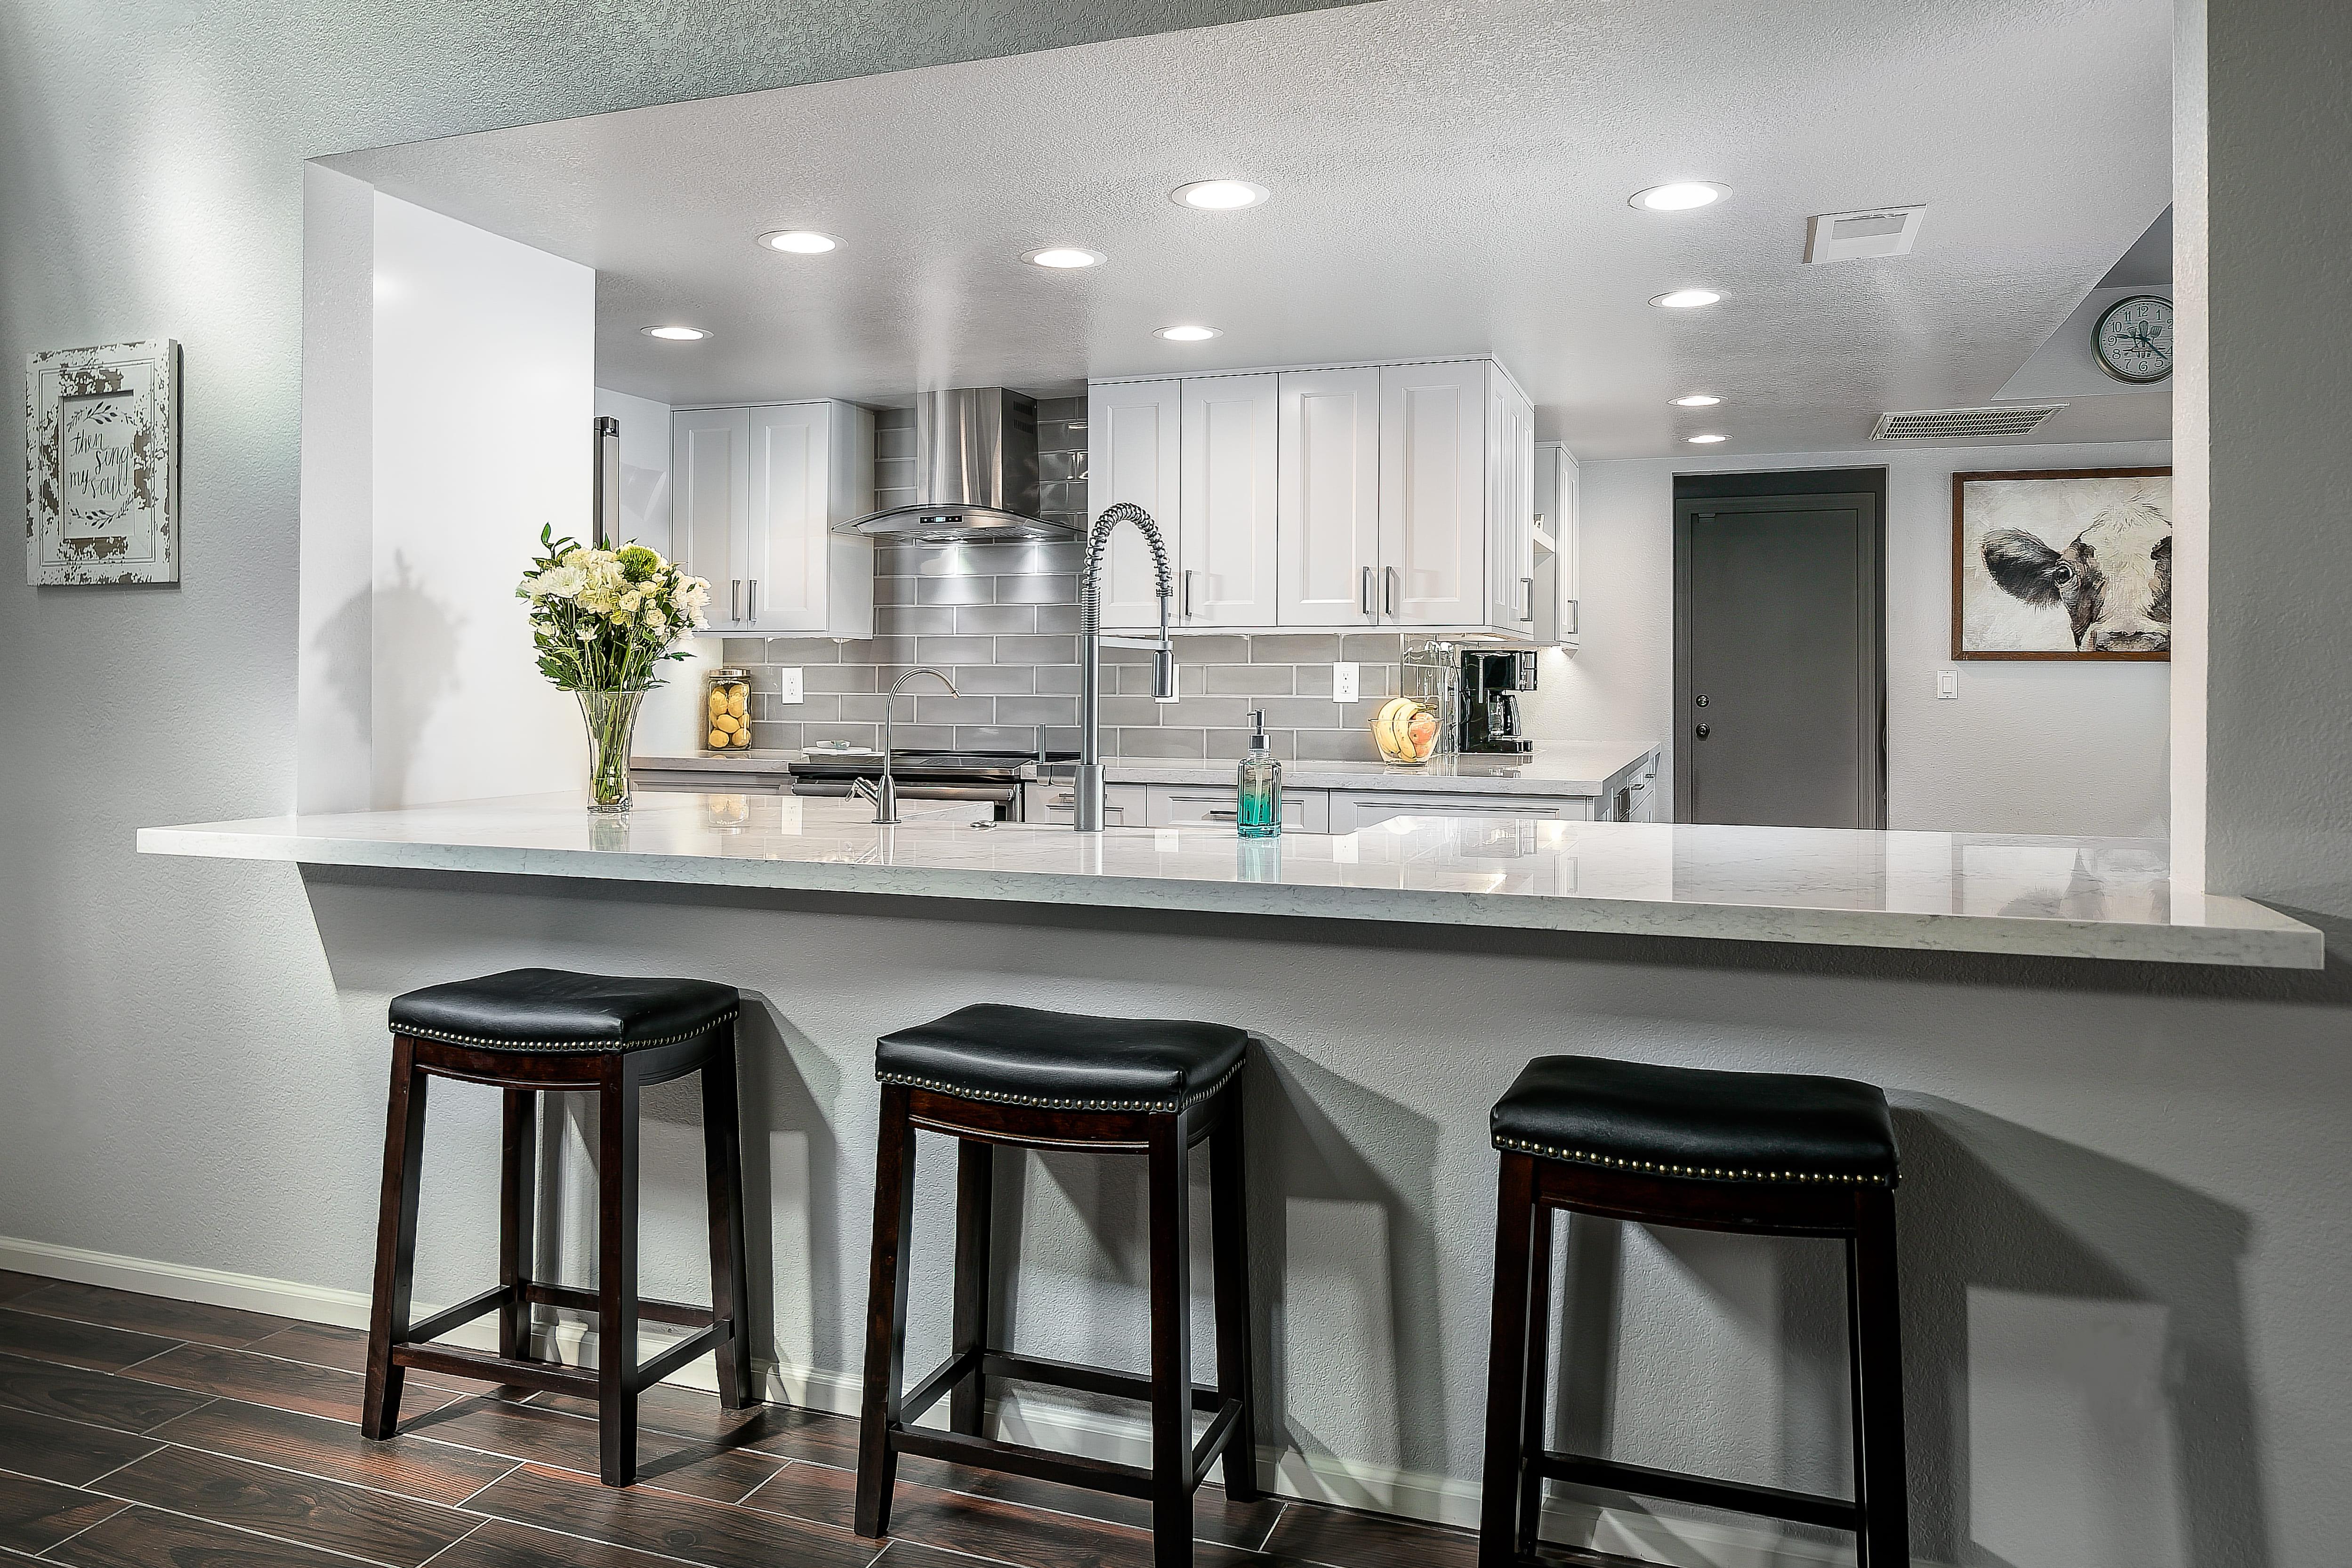 Design Build Kitchen Contractor in Tempe